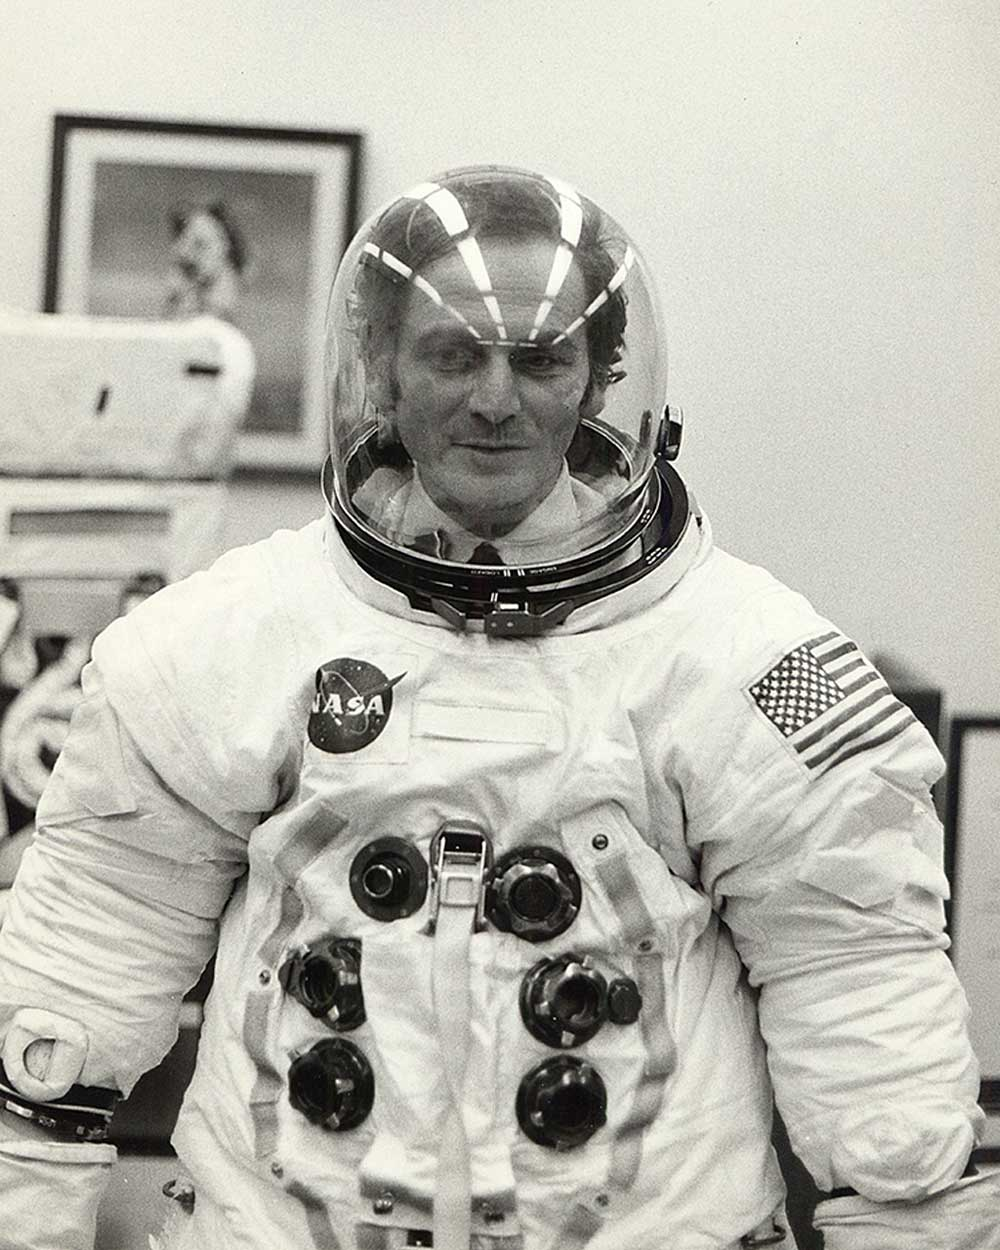 Pierre Cardin Moon Uniform for Nasa